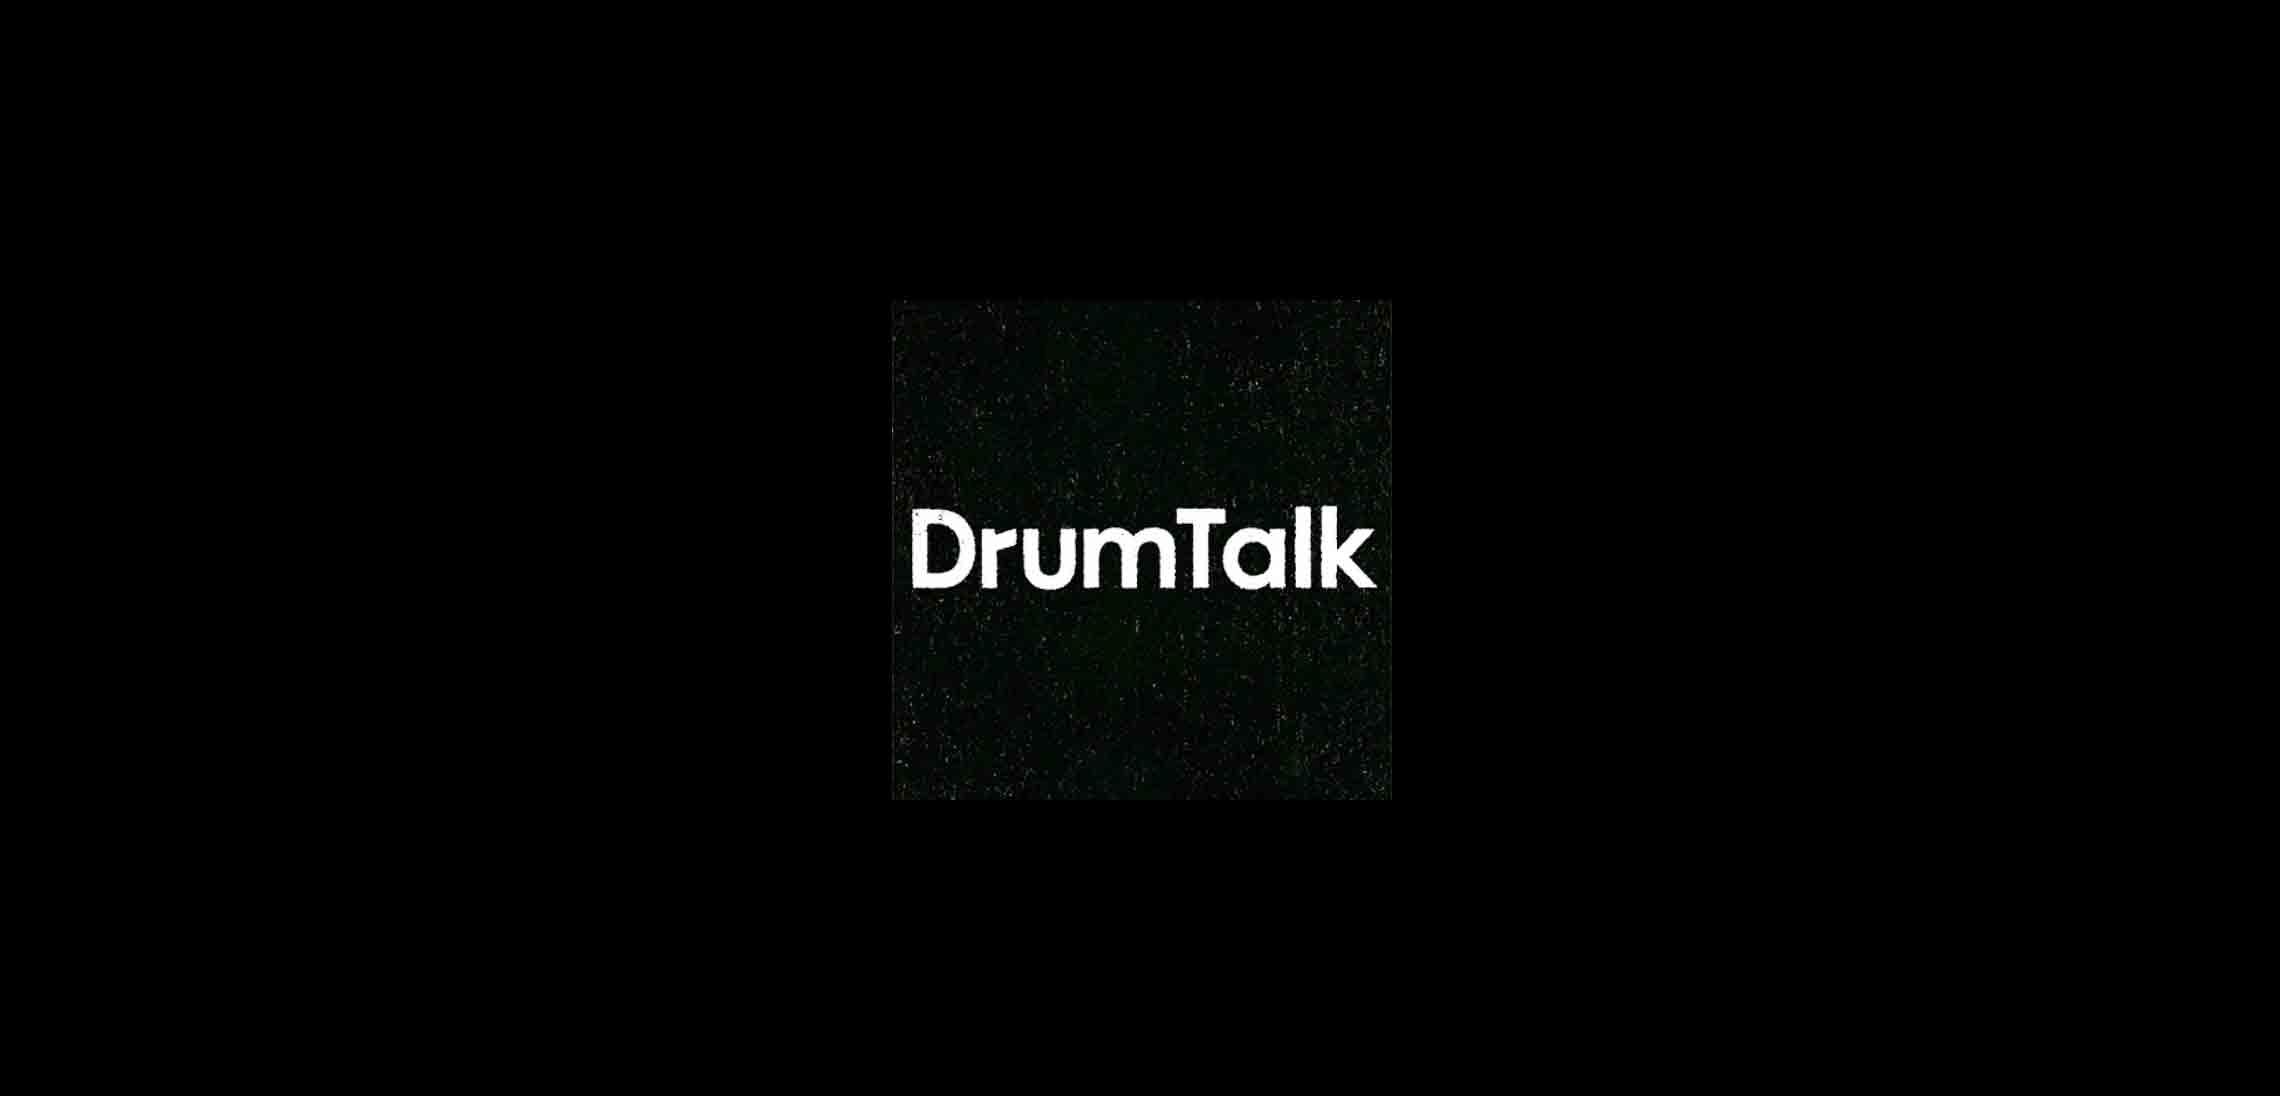 DrumTalk - Lose Again feat. Josa Peit hero